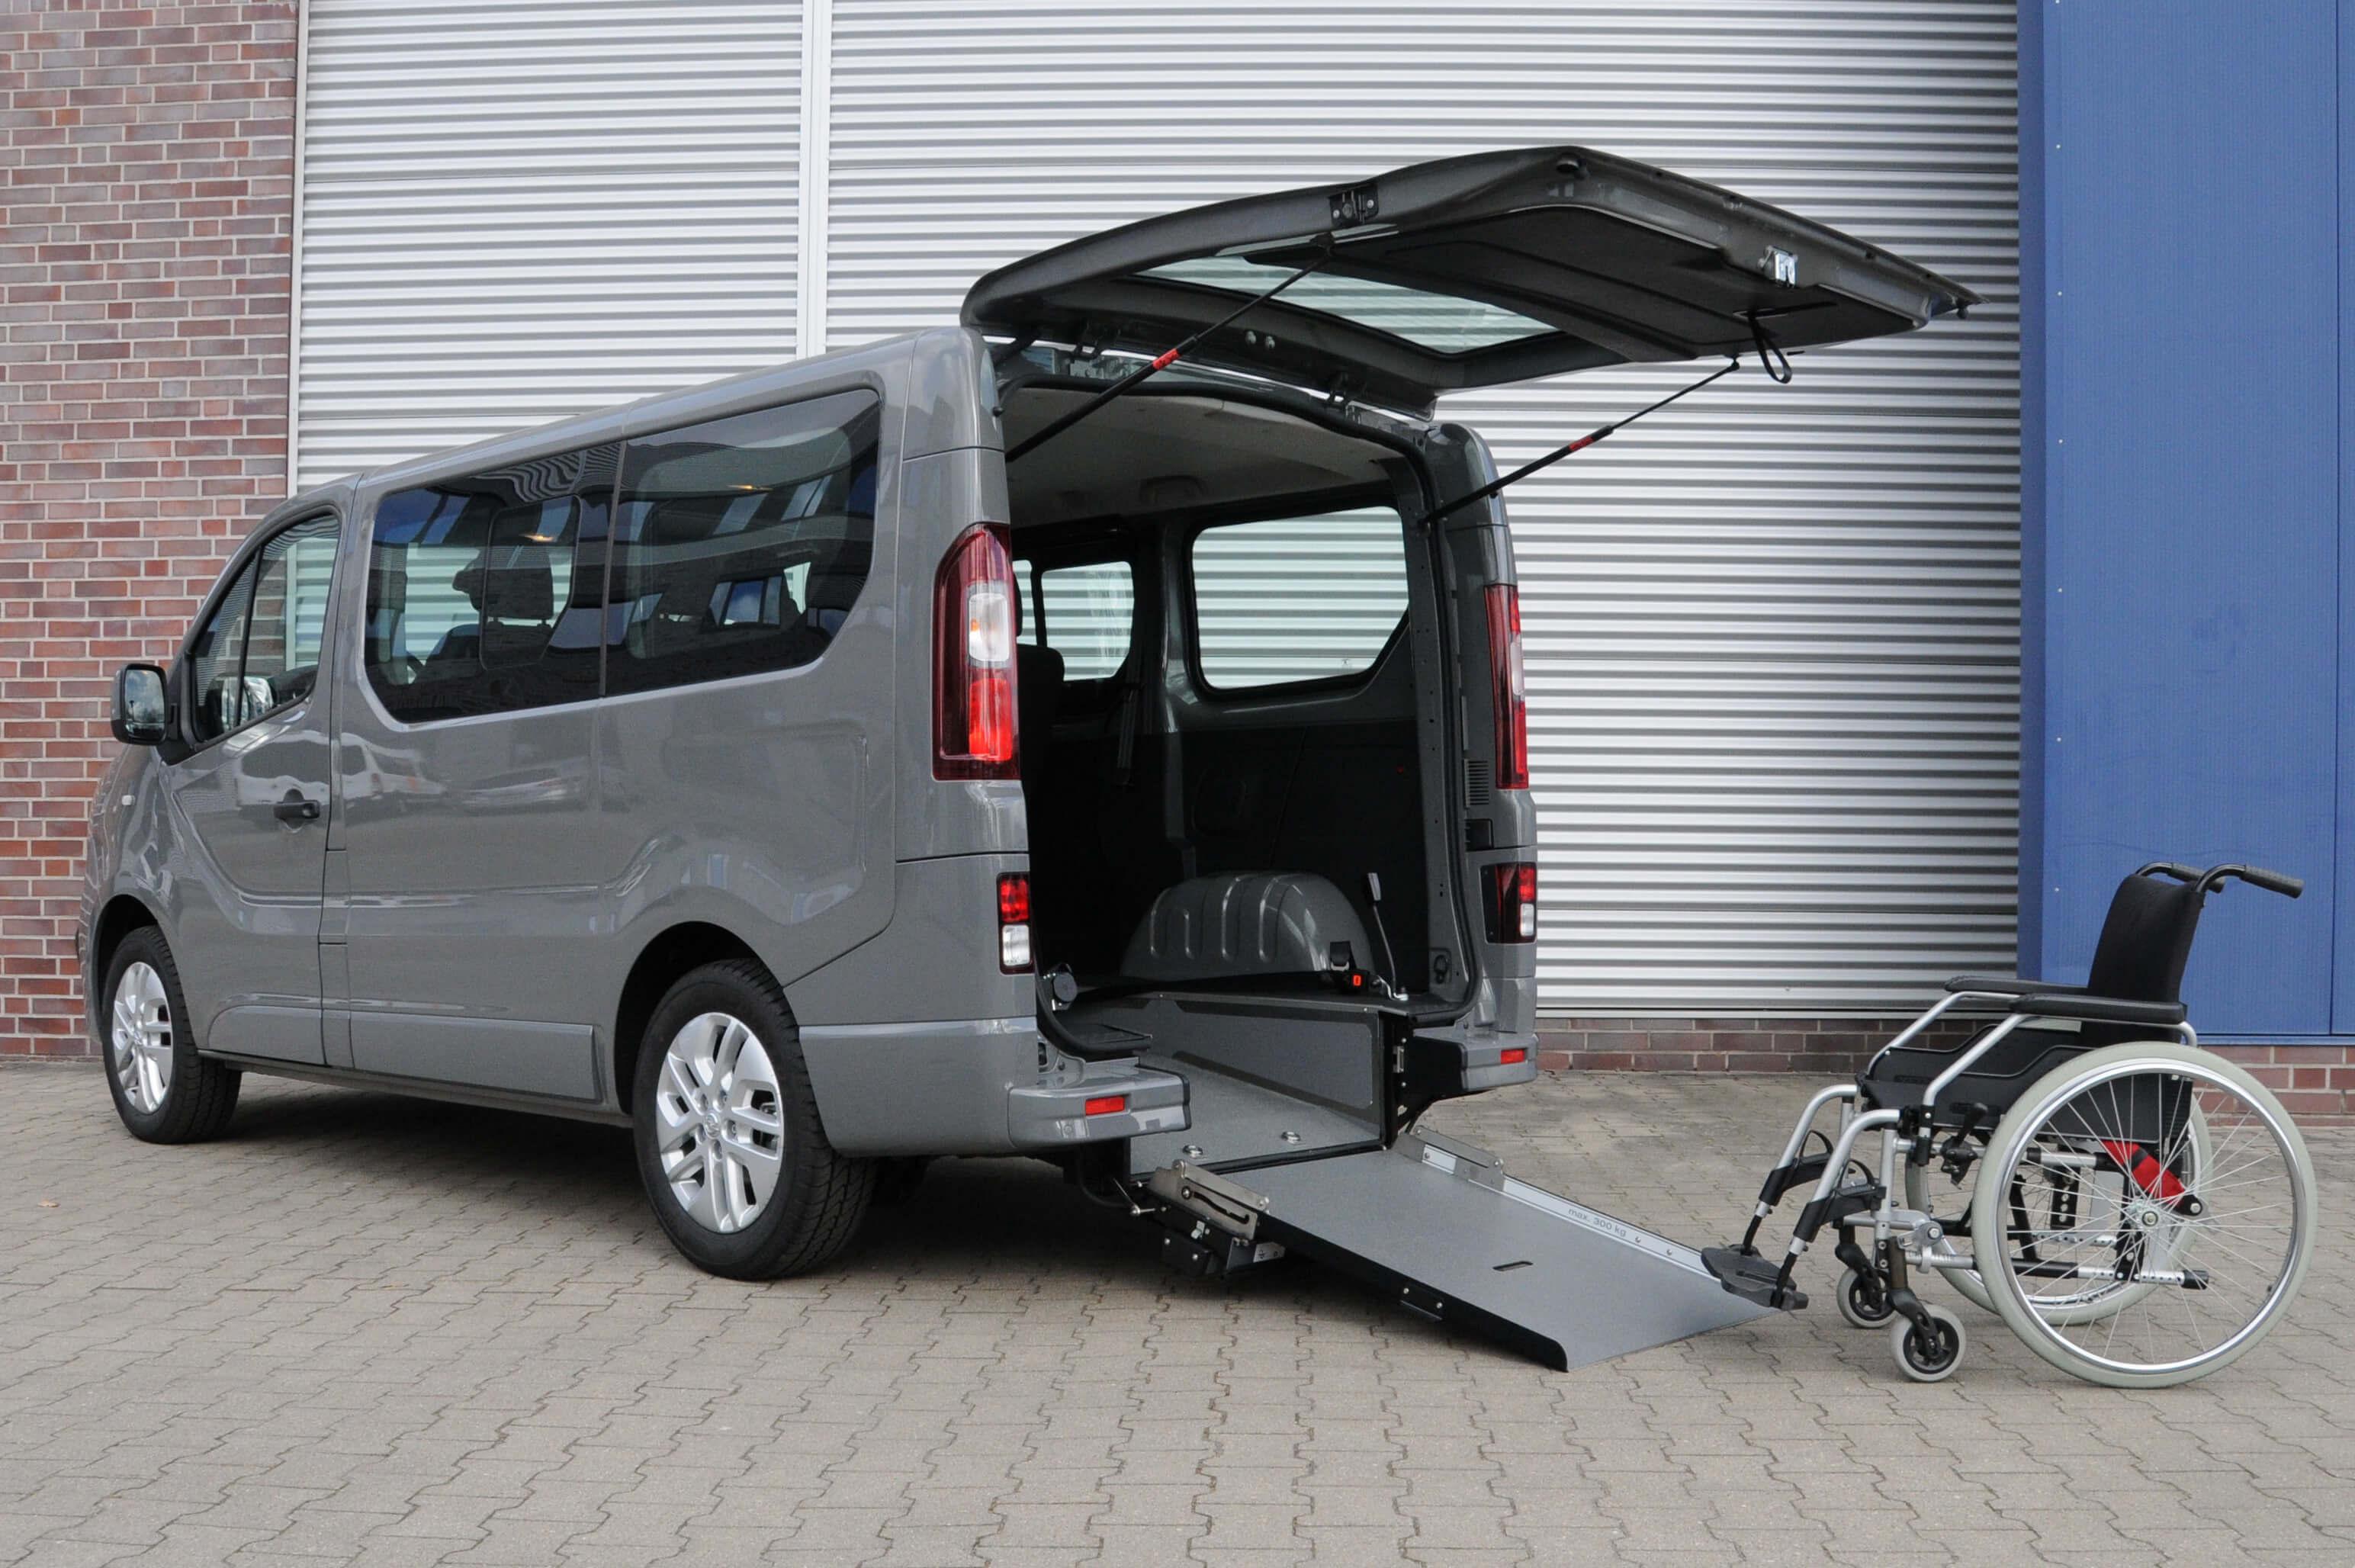 Opel Vivaro mit Heckausschnitt (1)